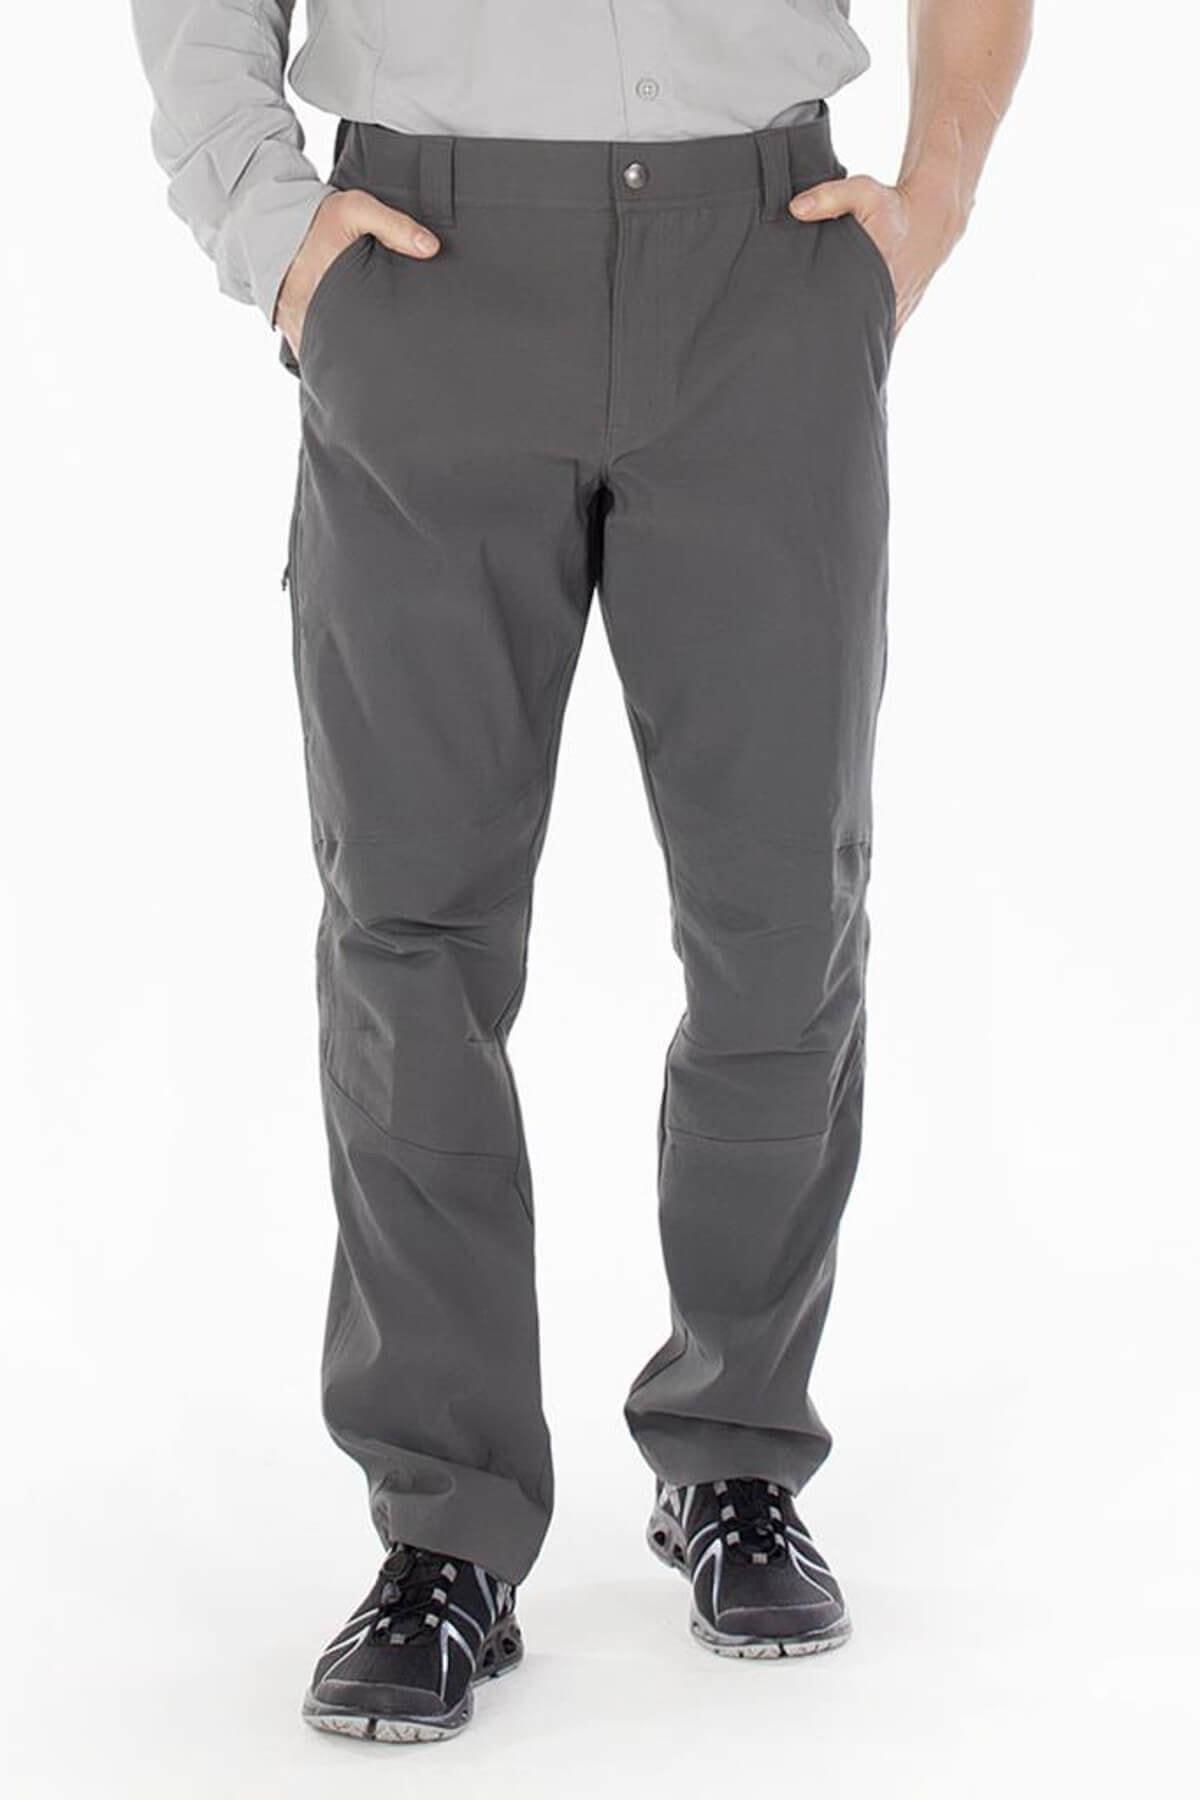 AM8116-028 Royce Peak Erkek Pantolon